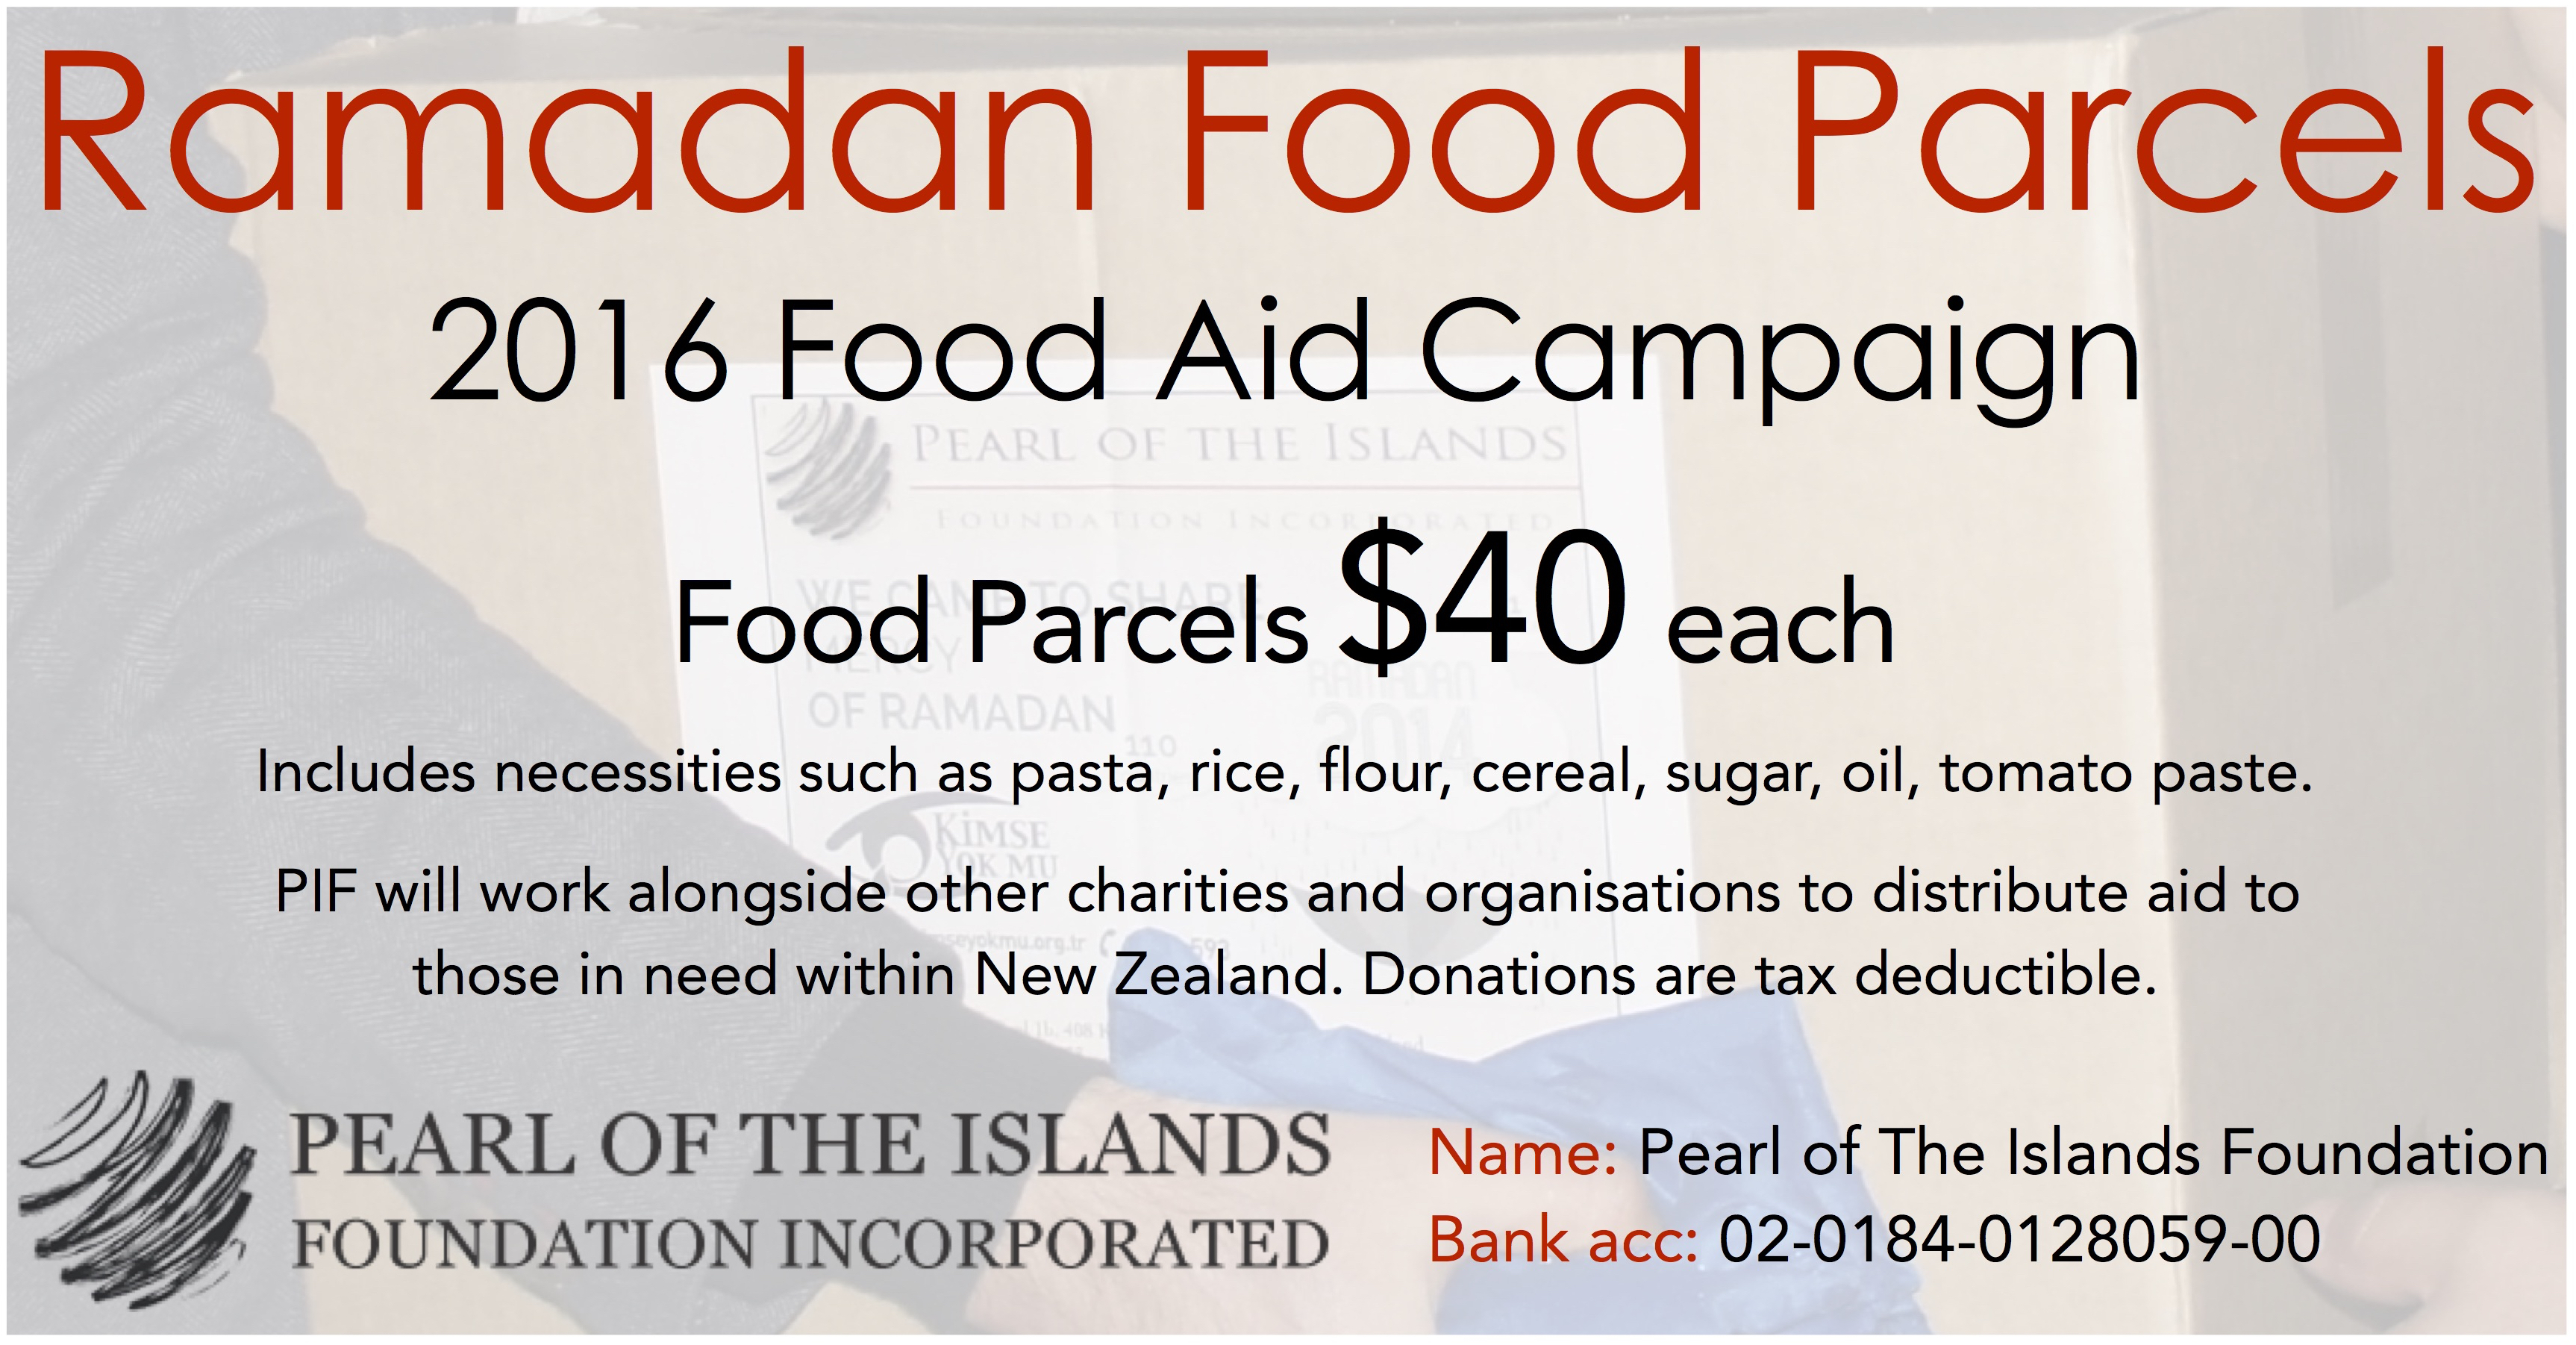 Ramadan Food Parcels – 2016 Food Aid Campaign